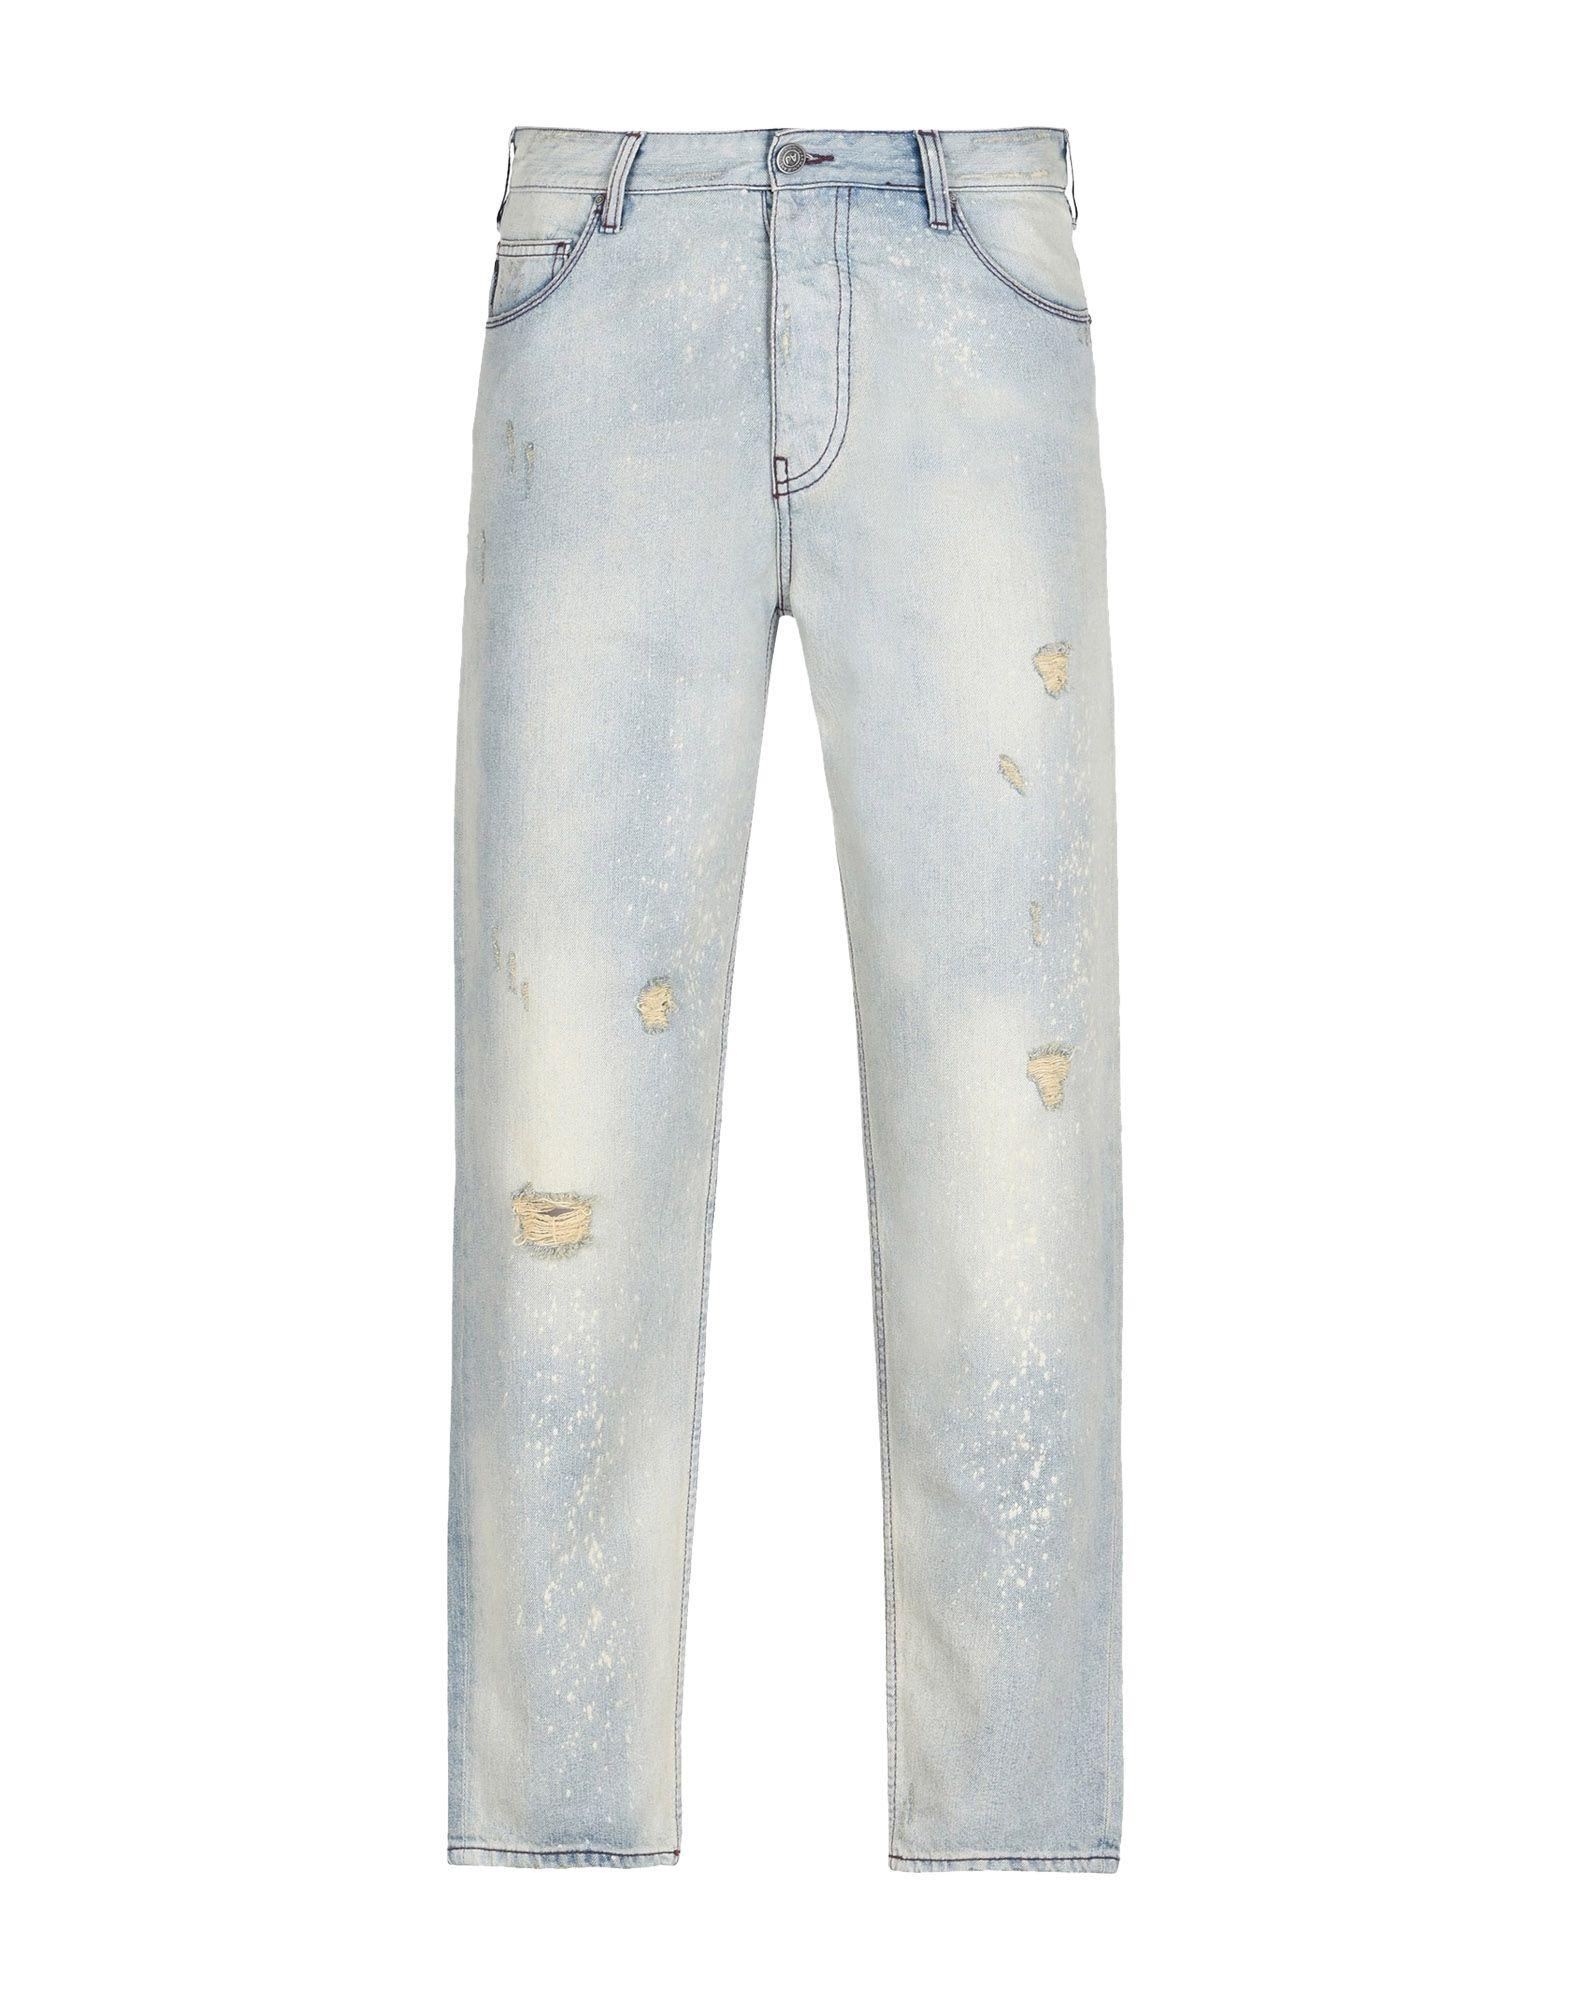 Pantaloni Jeans Armani Jeans Uomo - Acquista online su